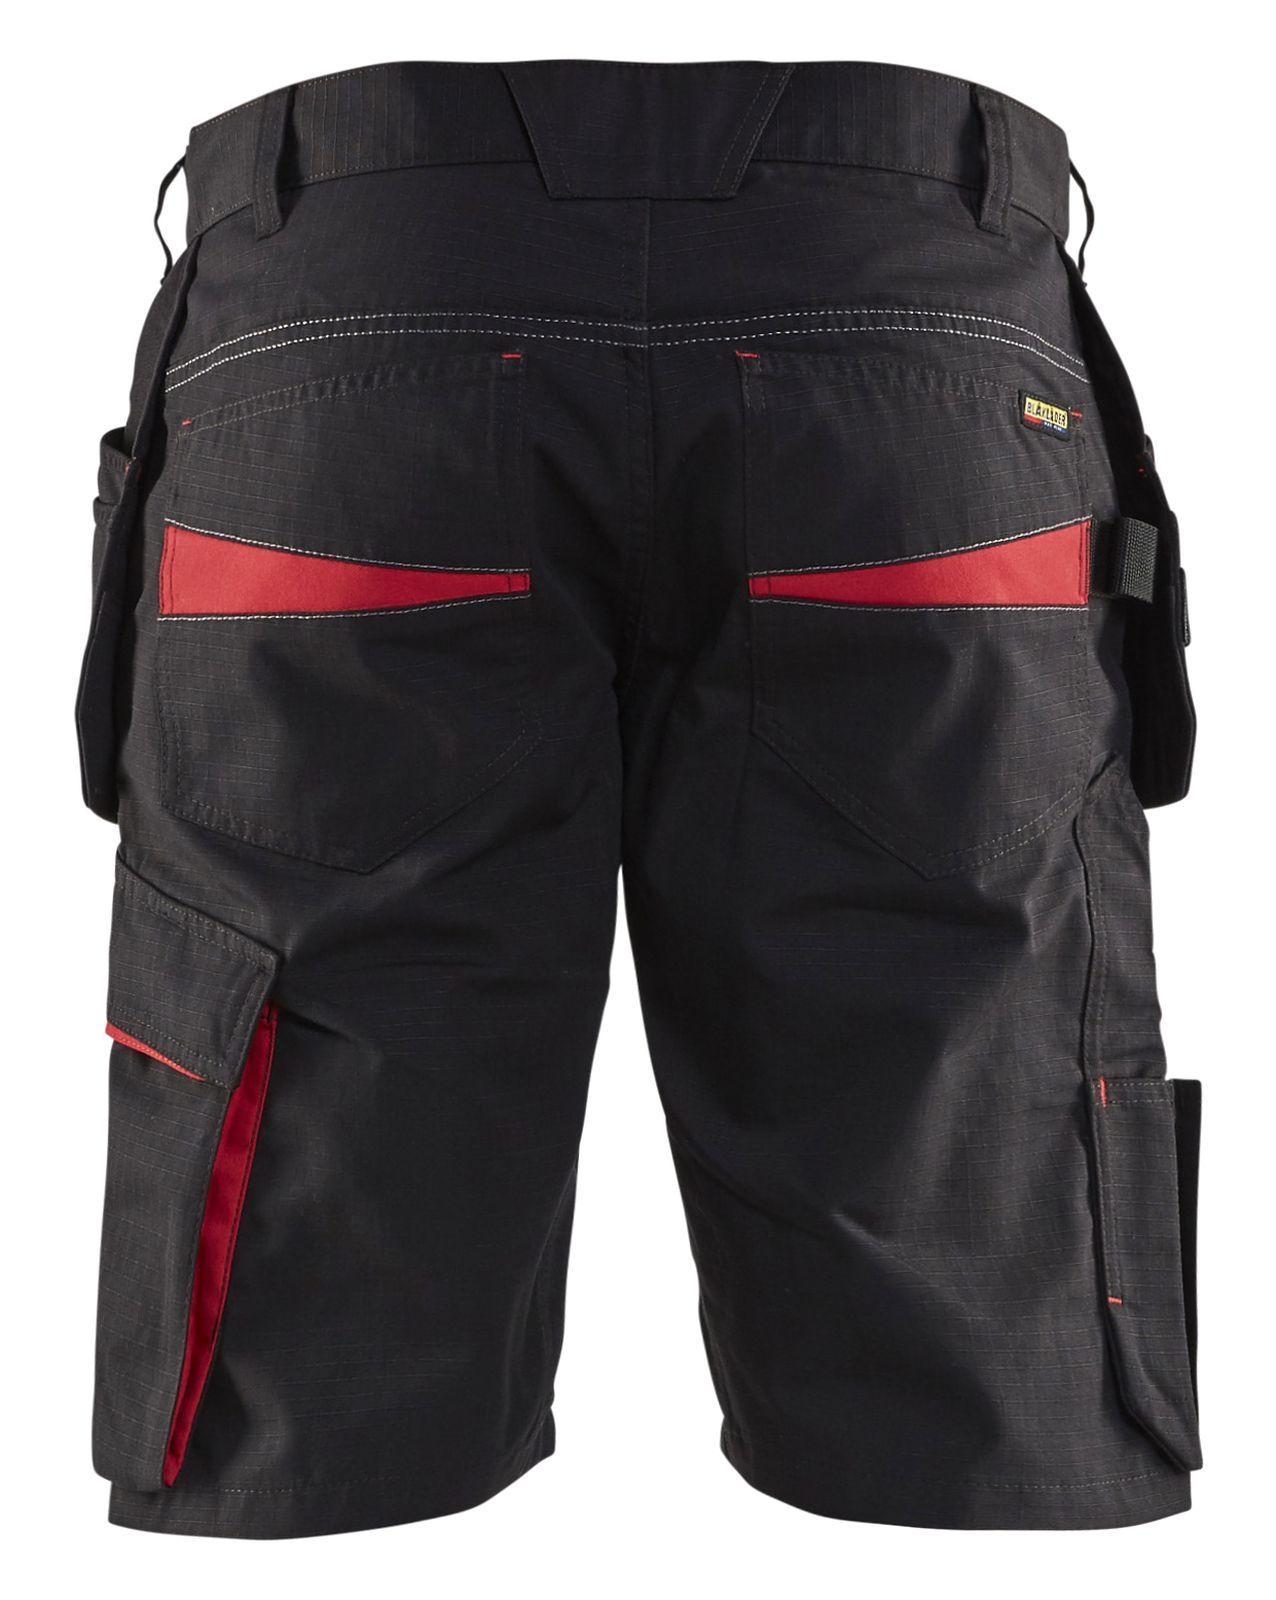 Blaklader Korte werkbroeken 14941330 zwart-rood(9956)